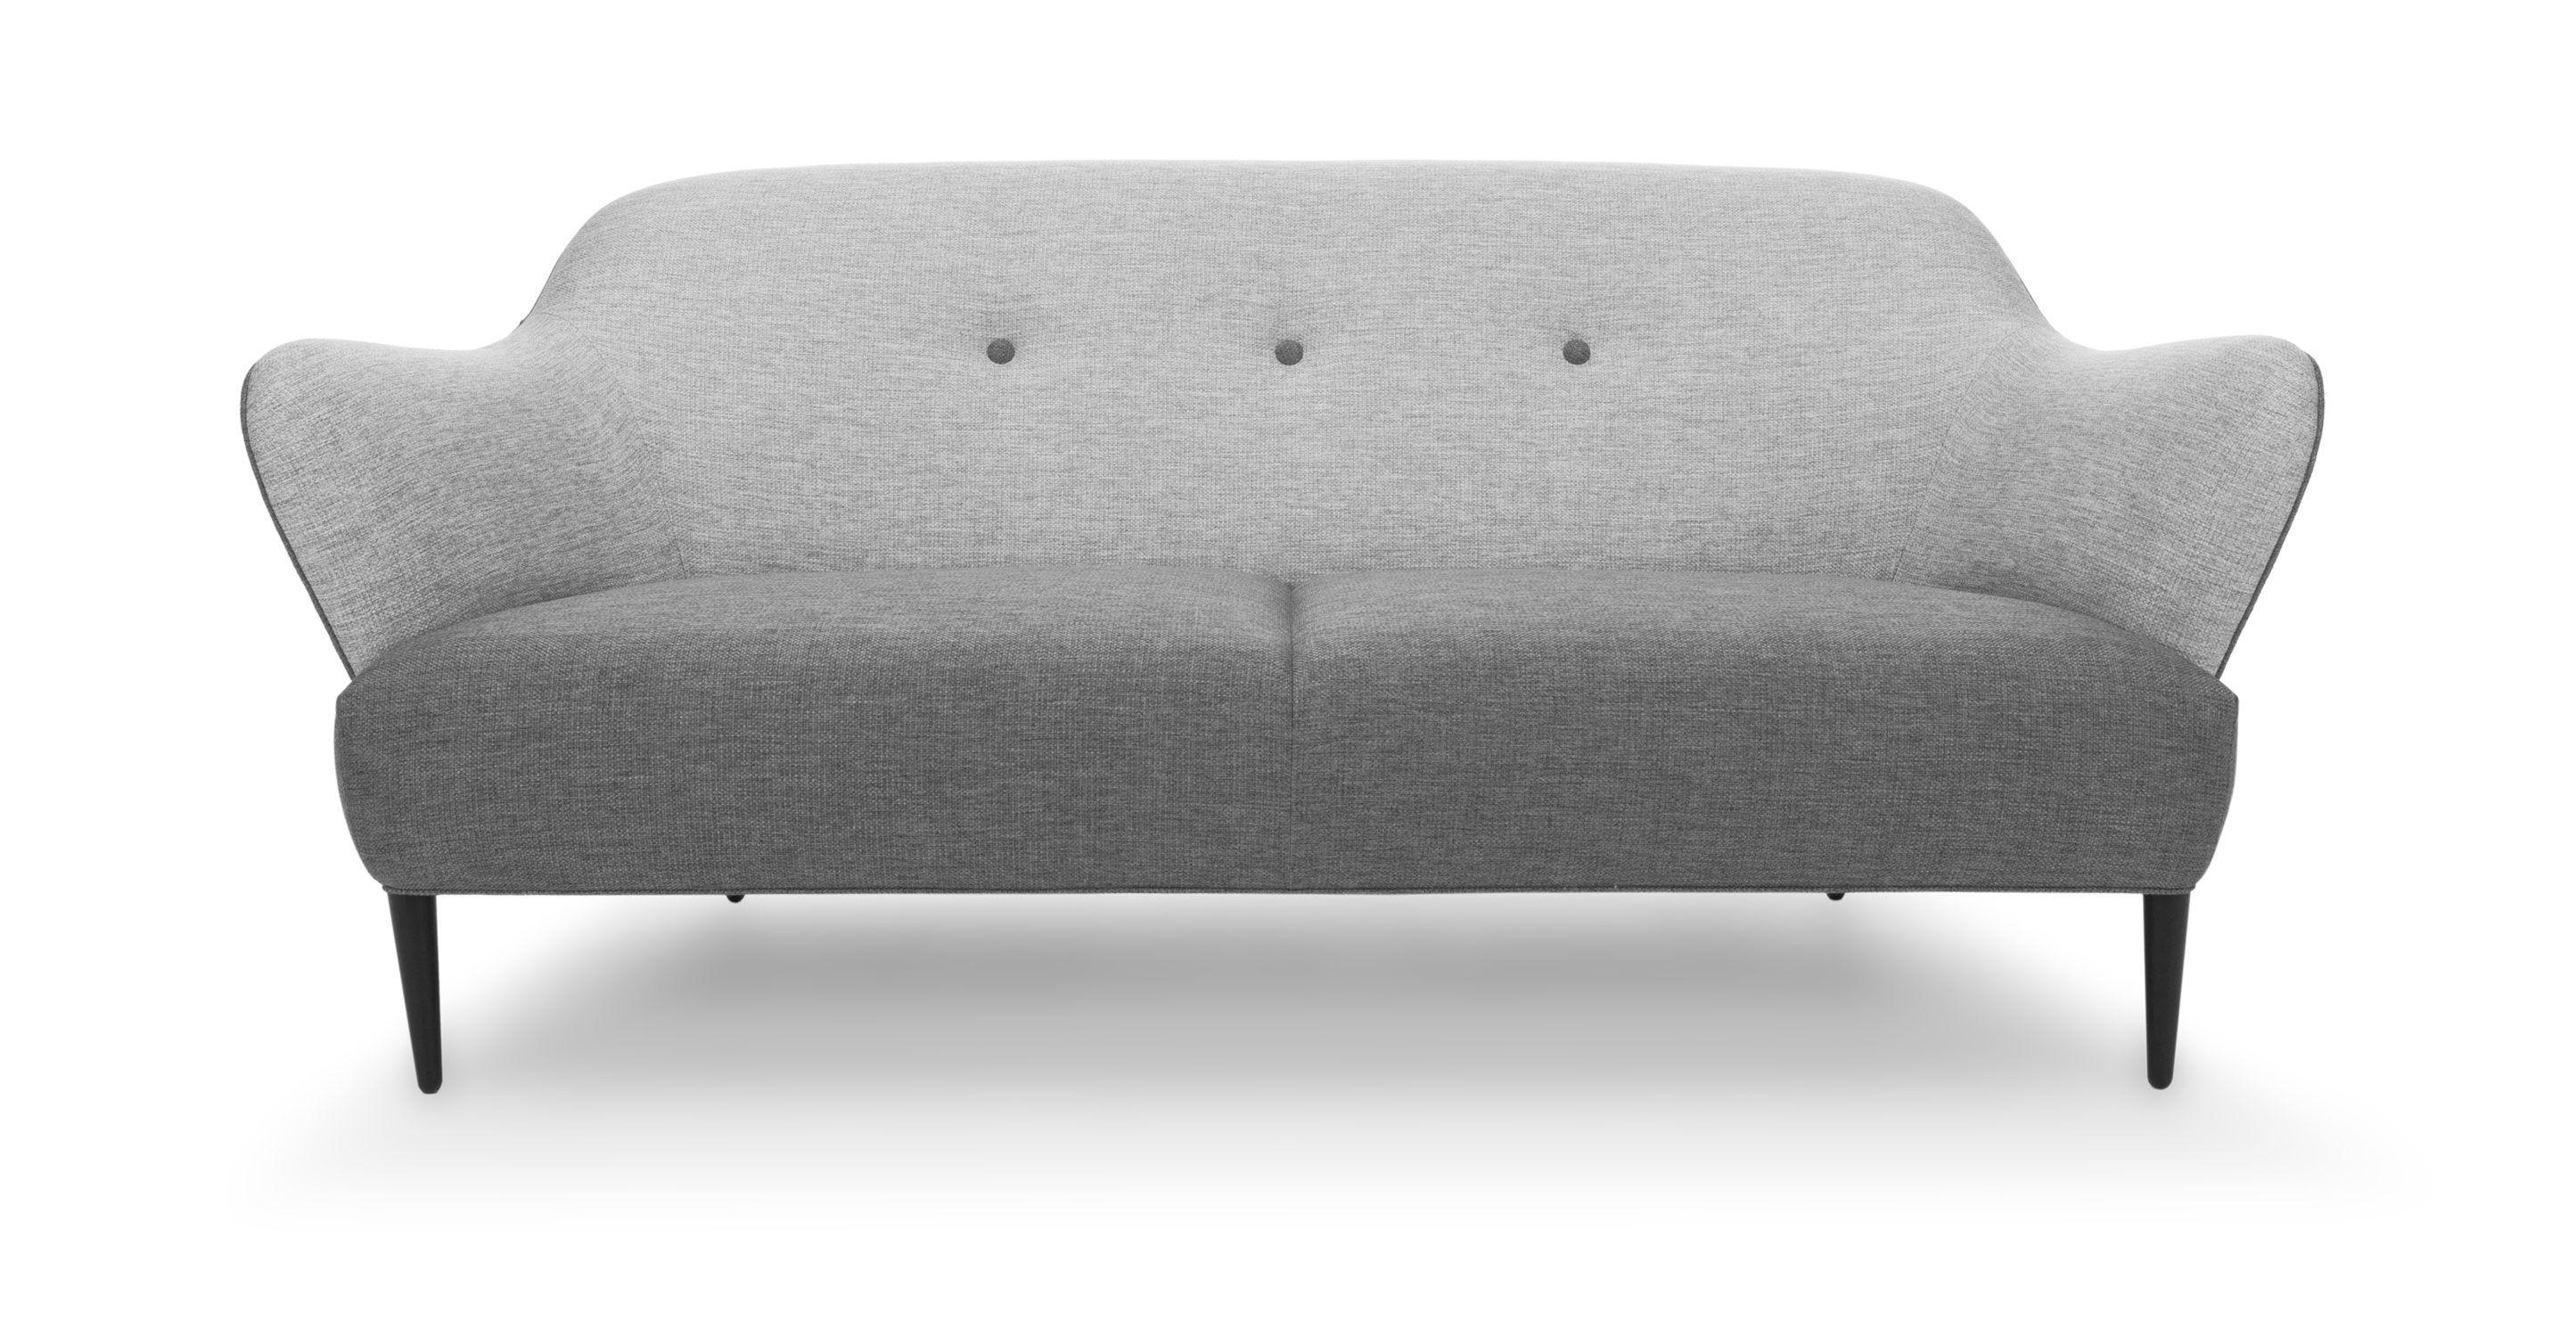 Retro Sofa Sofas Article Modern Mid Century And